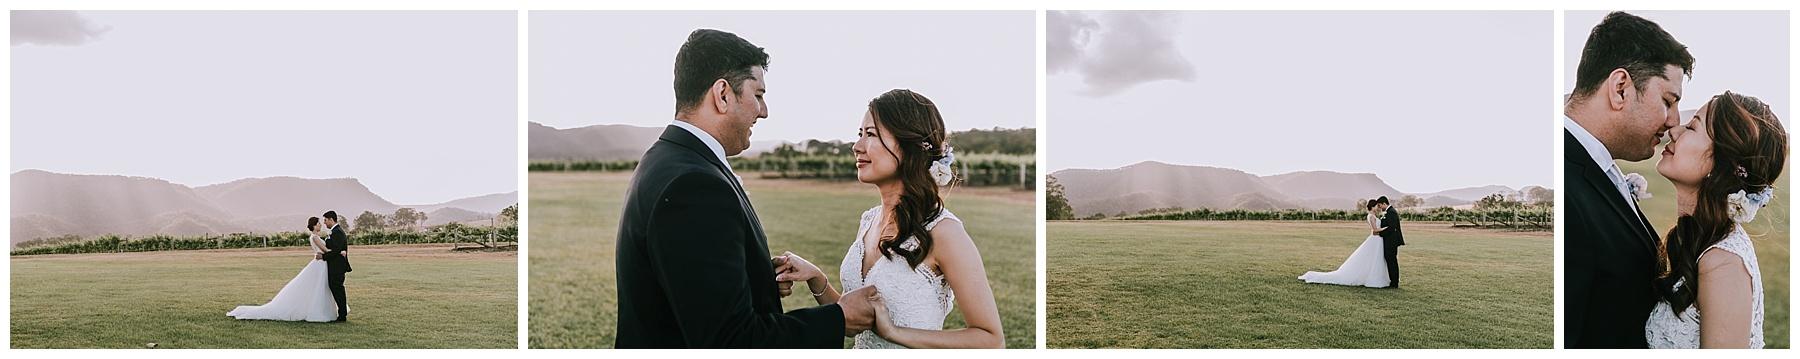 AUDREY WILKING COCKFIGHTERS GHOST Wedding Photographer_0059.jpg